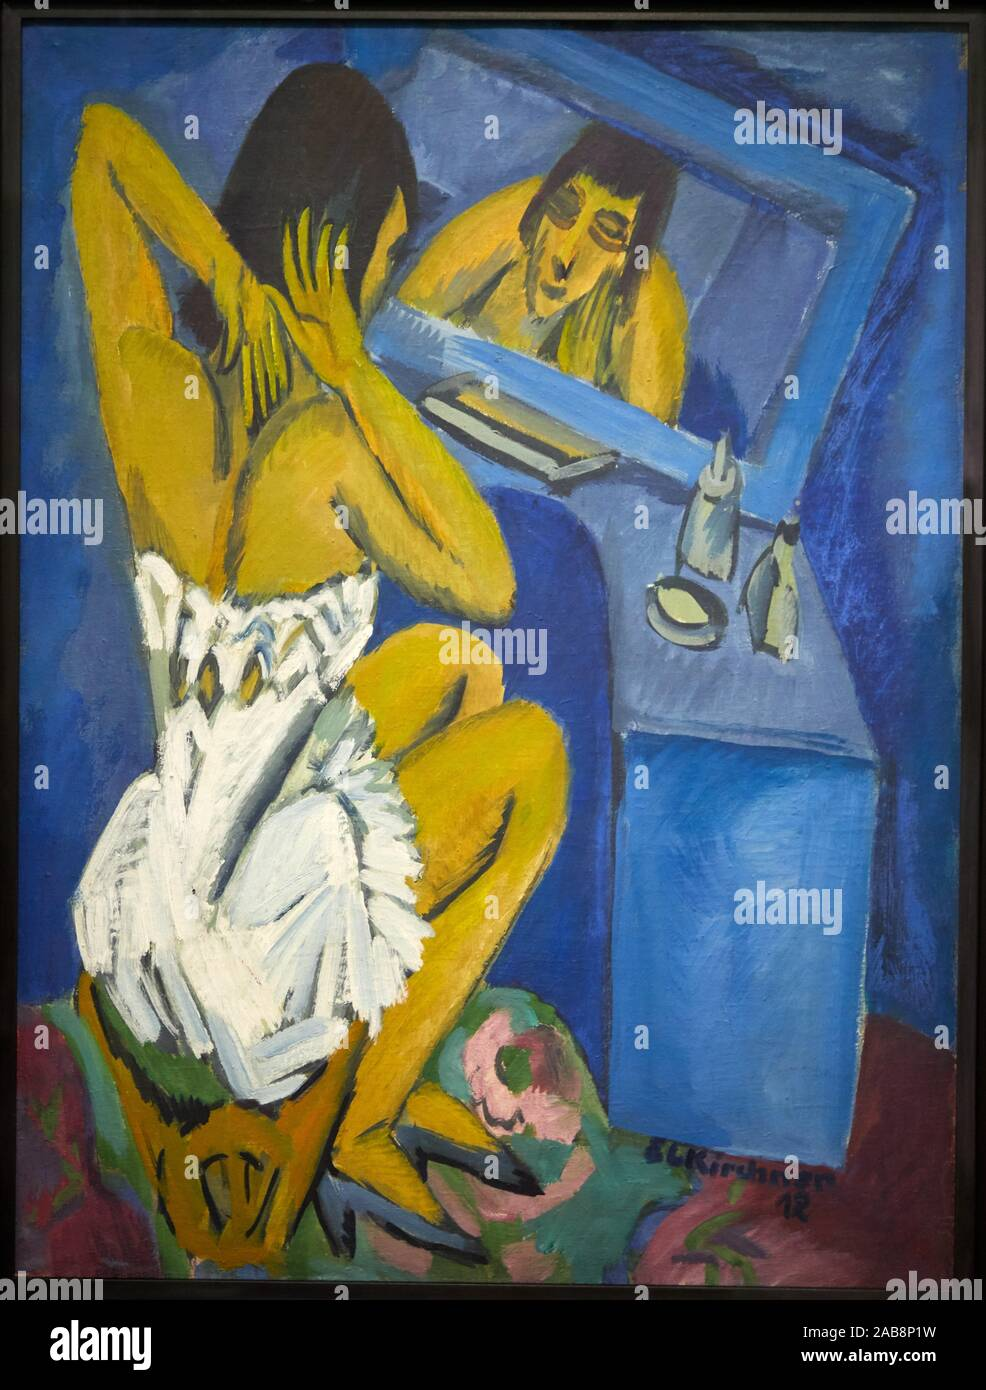 '''Toilette - Frau vor dem Spiegel'', 1913-1920, Ernst Ludwig Kirchner, Centro Pompidou, París, Francia, Europa Foto de stock